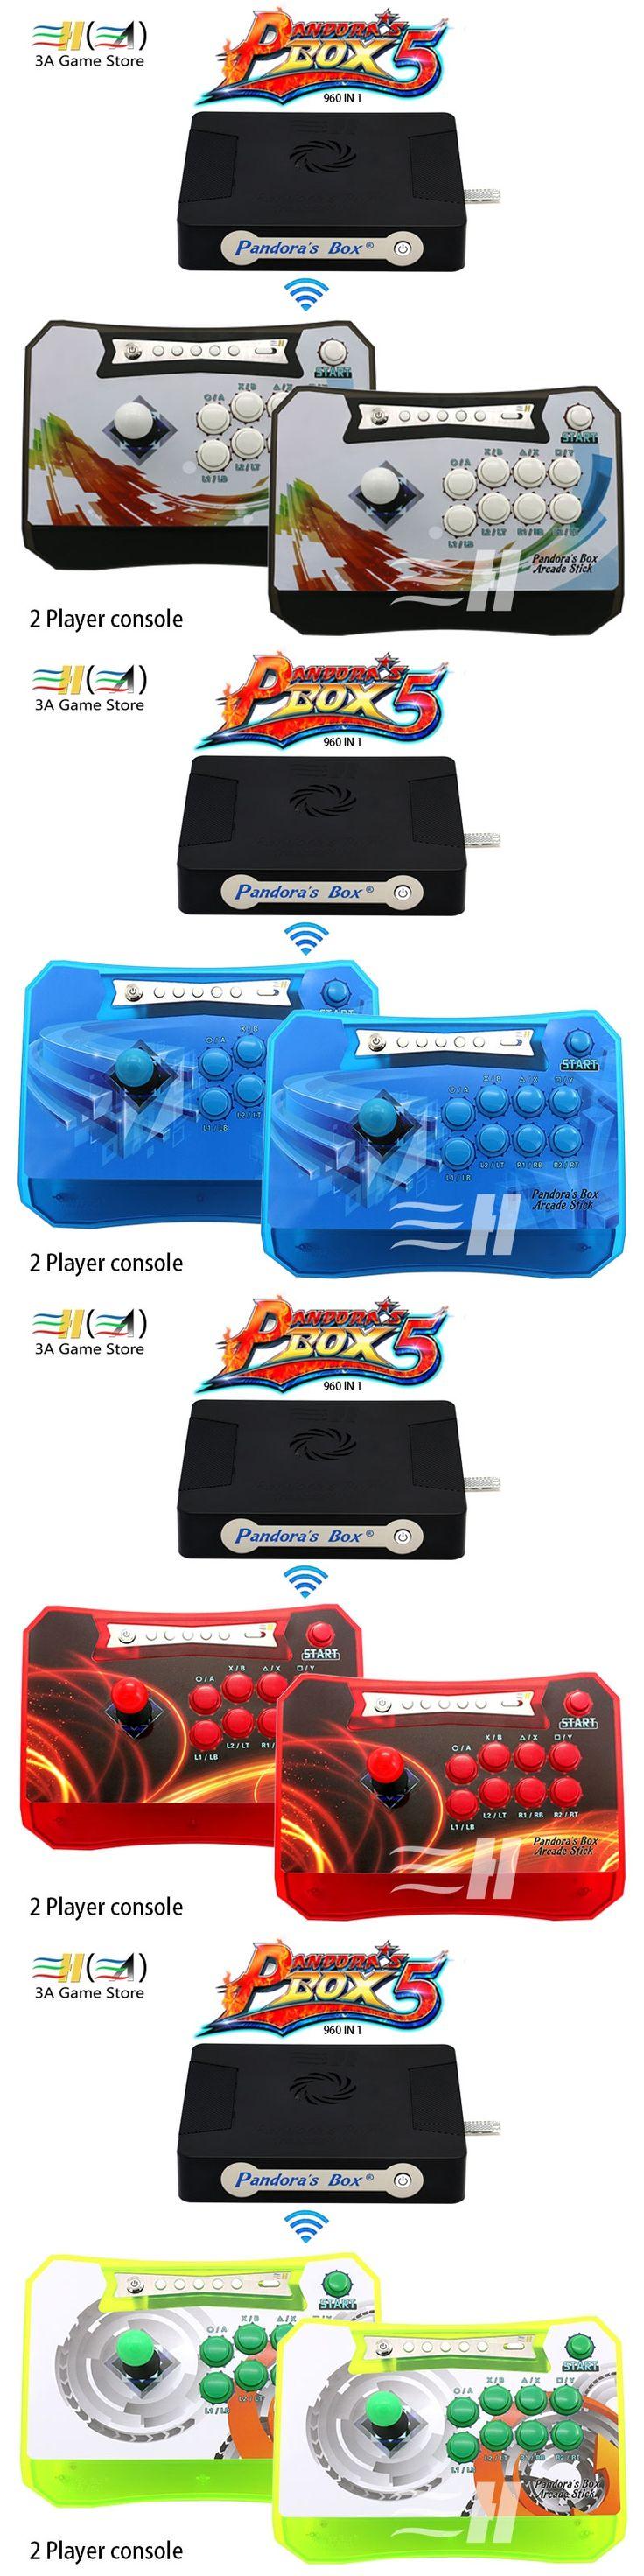 Pandora's Box Wireless Arcade Stick Combo Pandora Box 4S 680 in 1 Jamma Multi Game Board PS3 XBOX360 PC Arcade Controller Kit